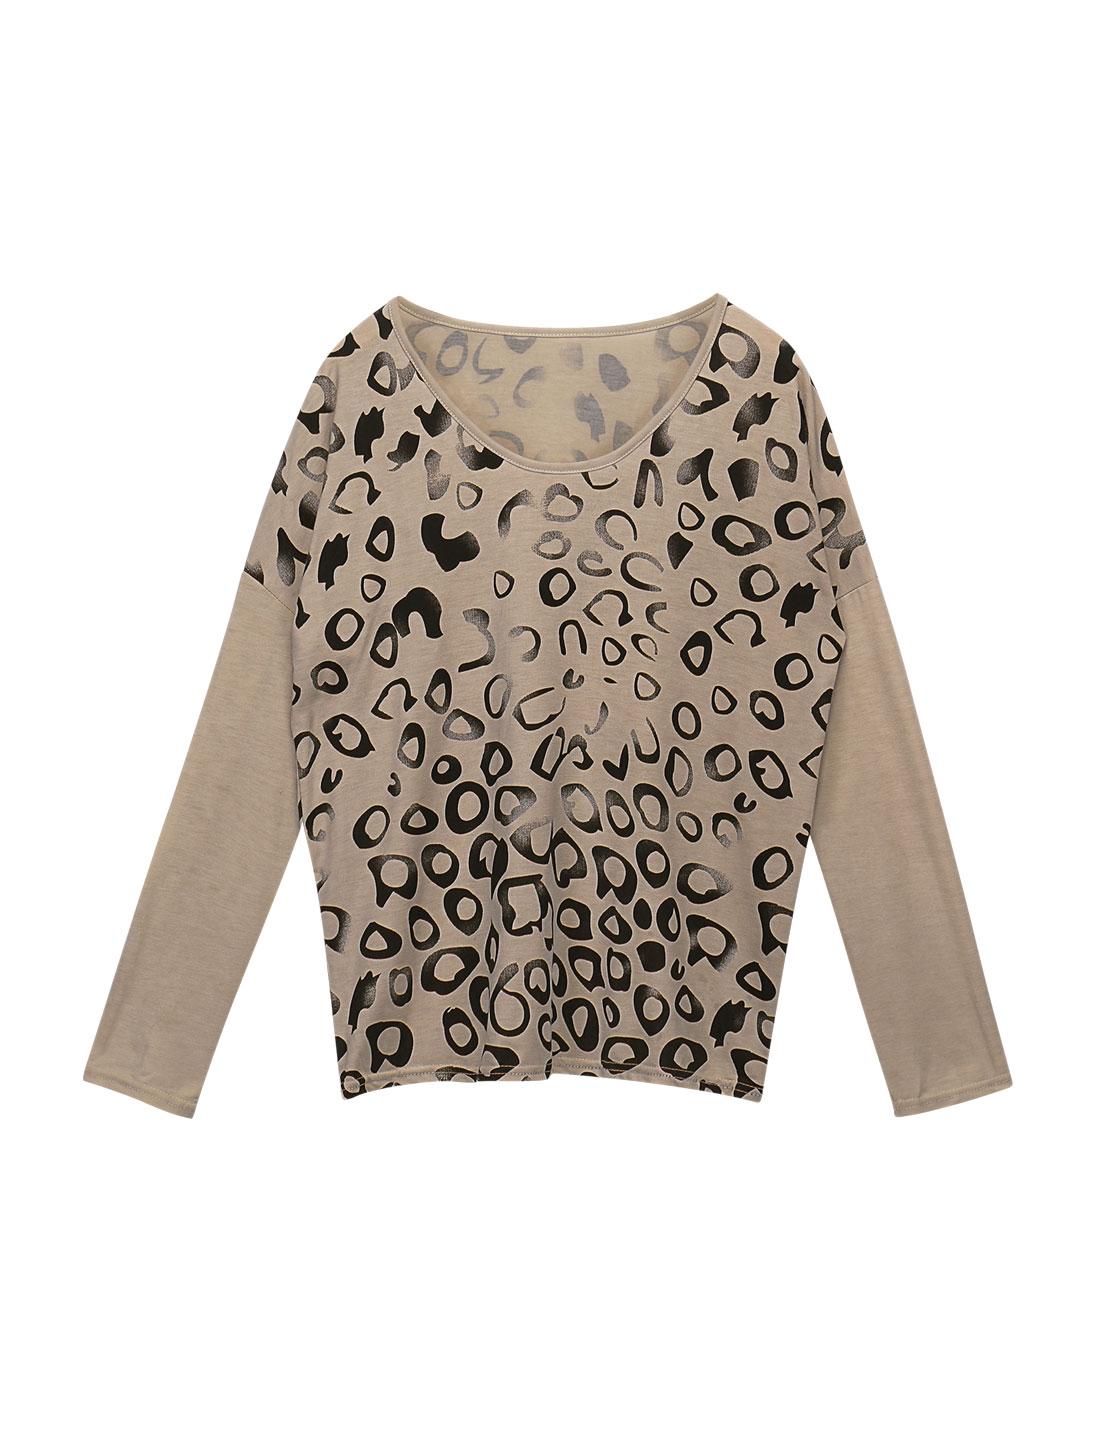 Women Scoop Neck Long Sleeves Leopard Prints Loose Top Beige M